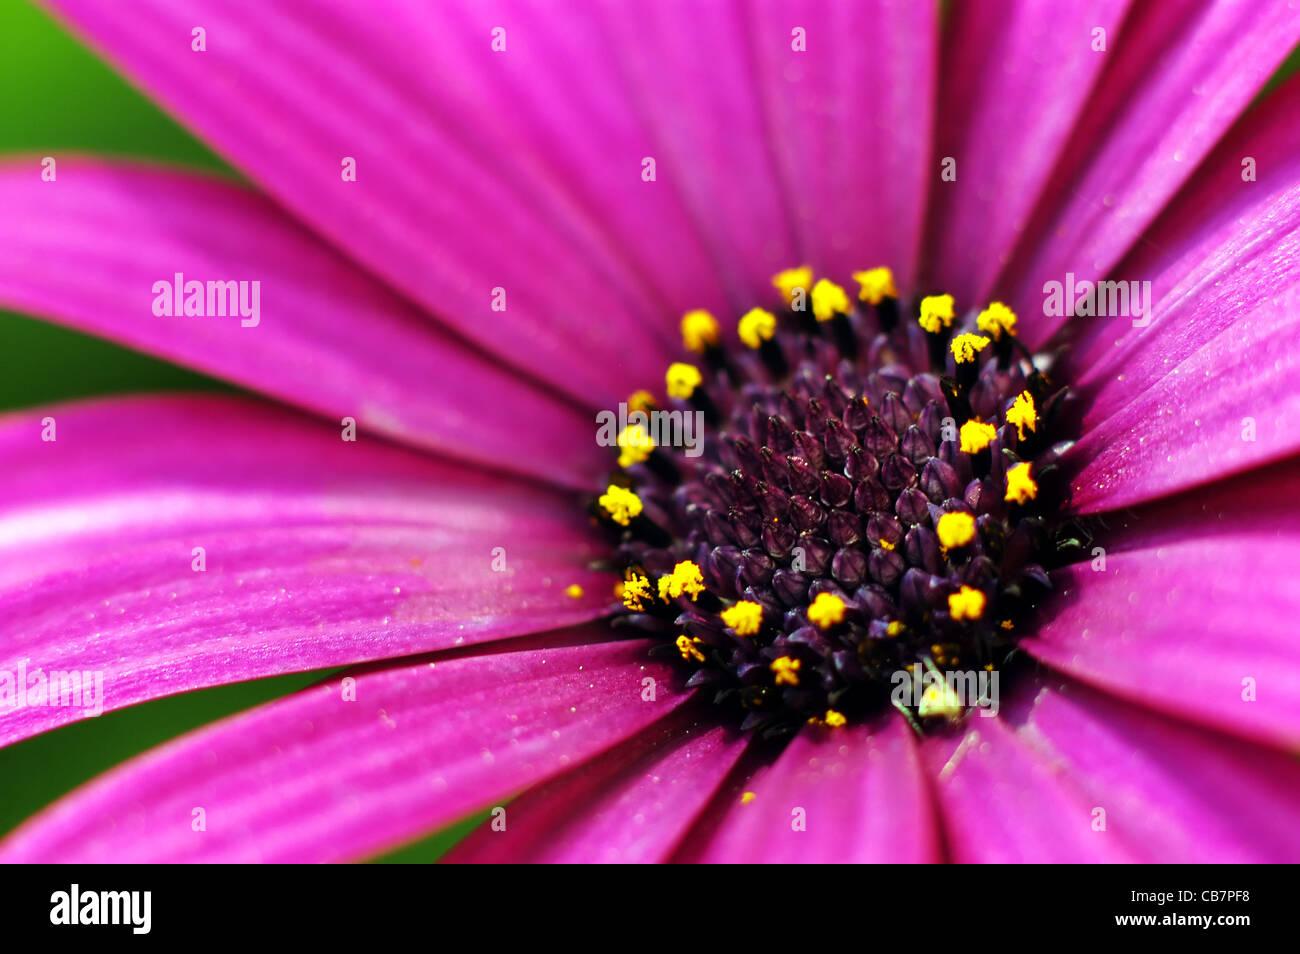 Photo of beautiful purple daisy flower stock photos photo of a closeup photo of a purple daisy flower stock image izmirmasajfo